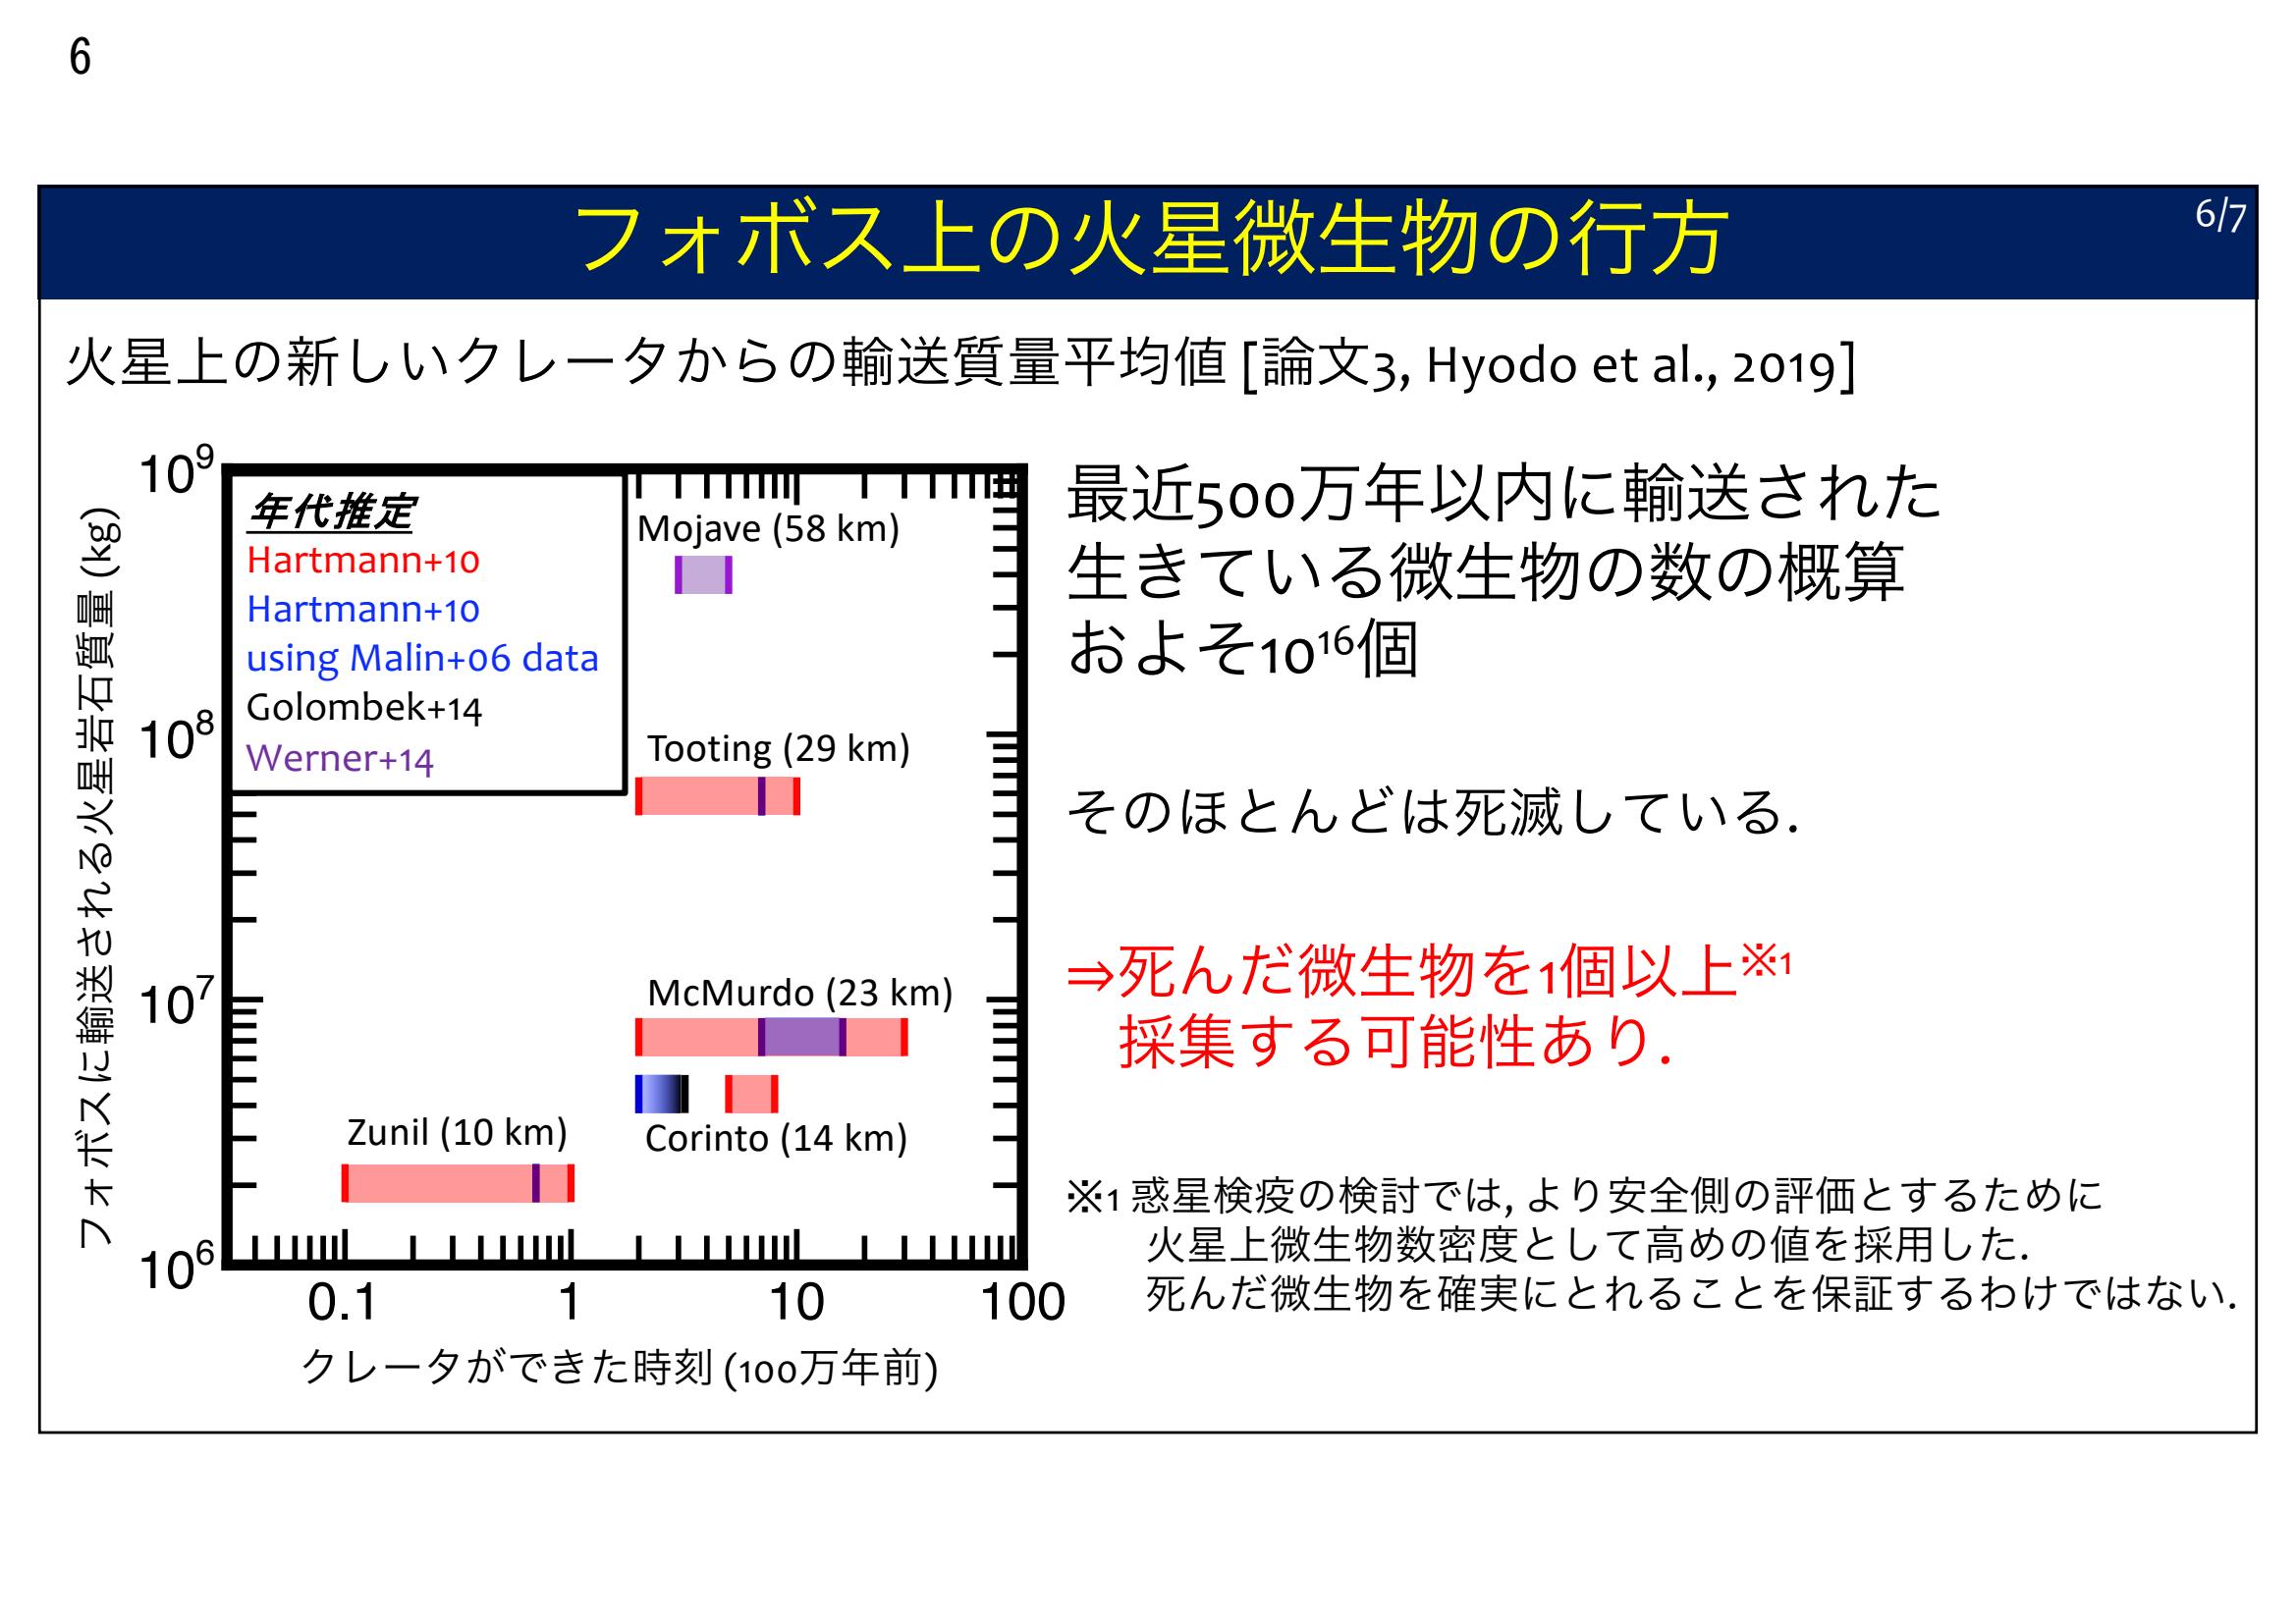 f:id:Imamura:20210819095414p:plain